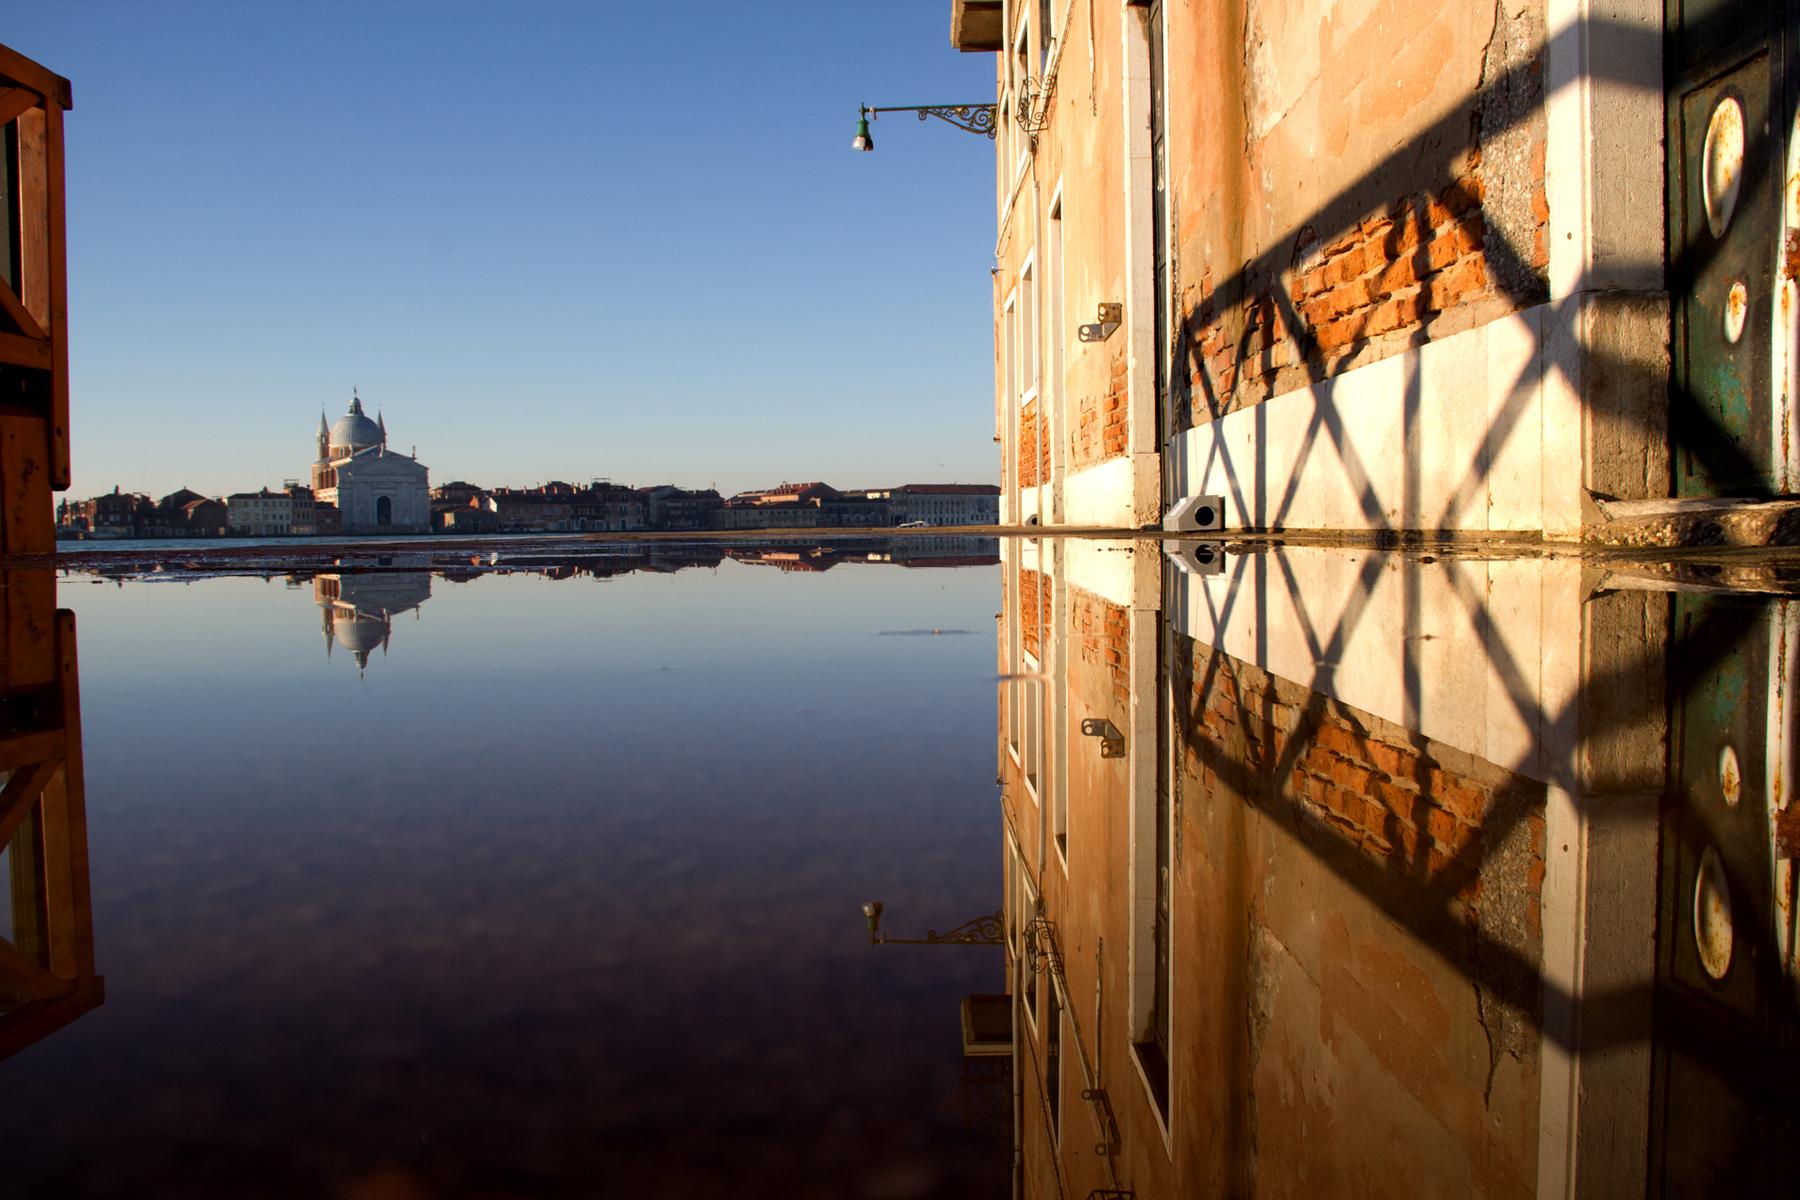 India or Venice